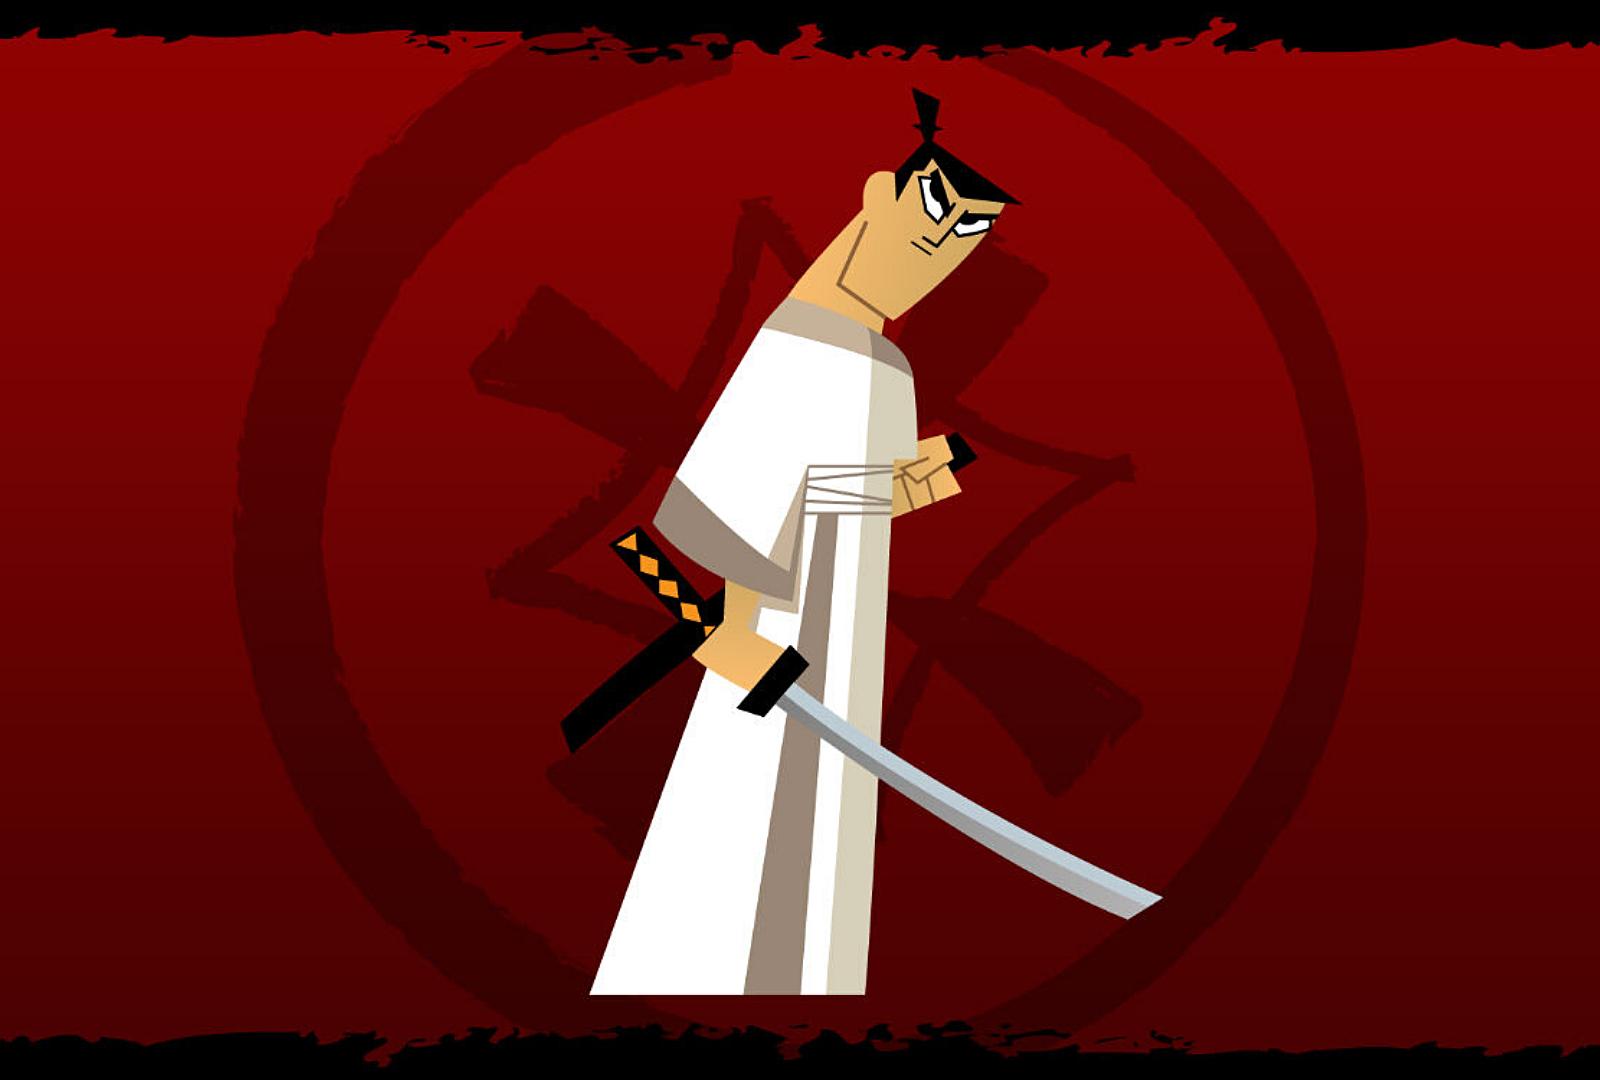 Adult Swim Makes Samurai Jack Free To Watch On Their Website